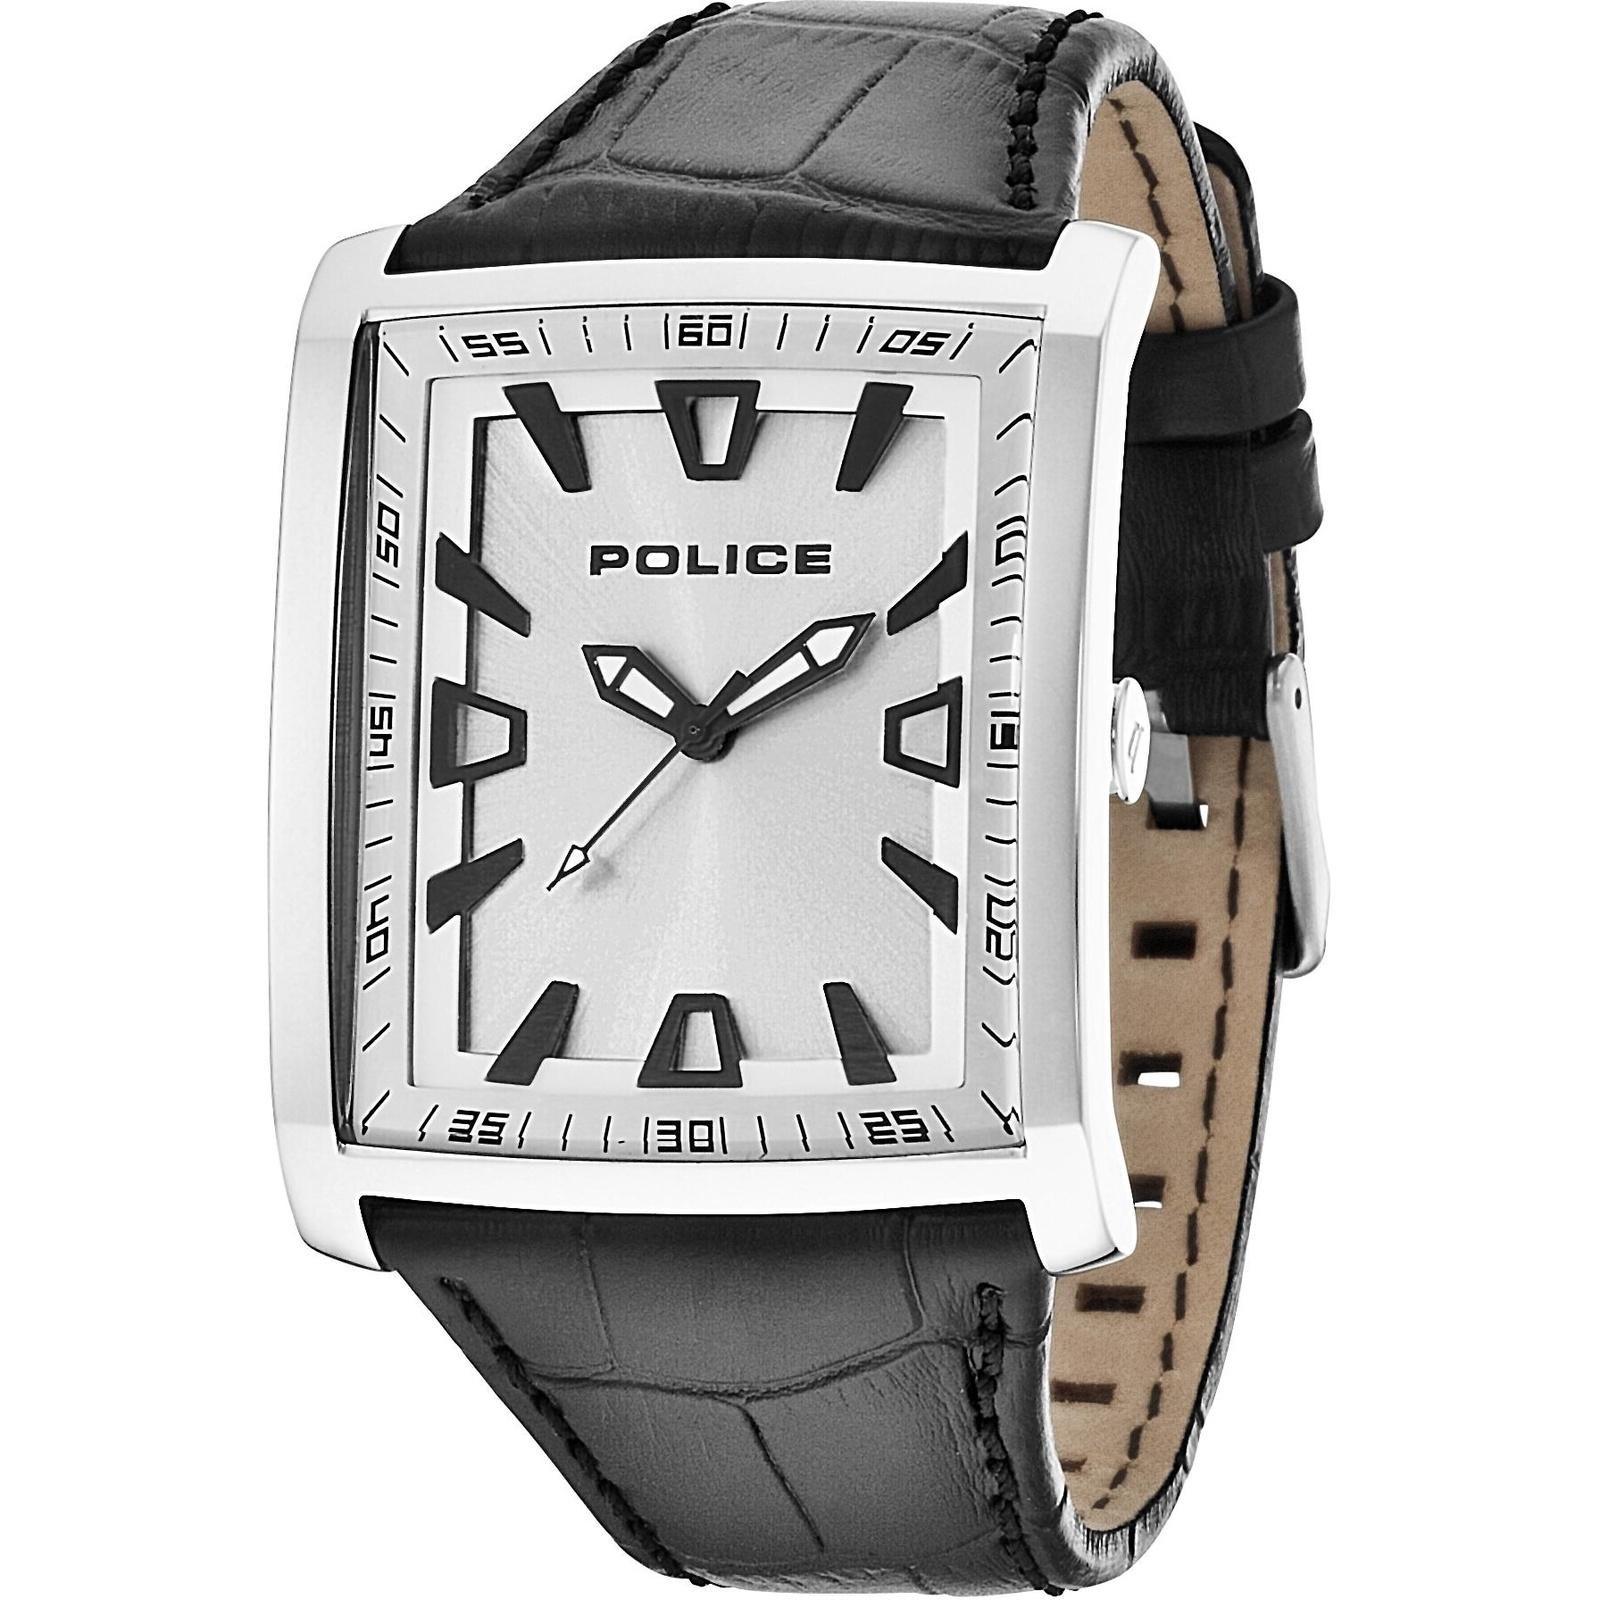 Наручные часы Police PL.14002JS-04 police pl 13836jsu 04